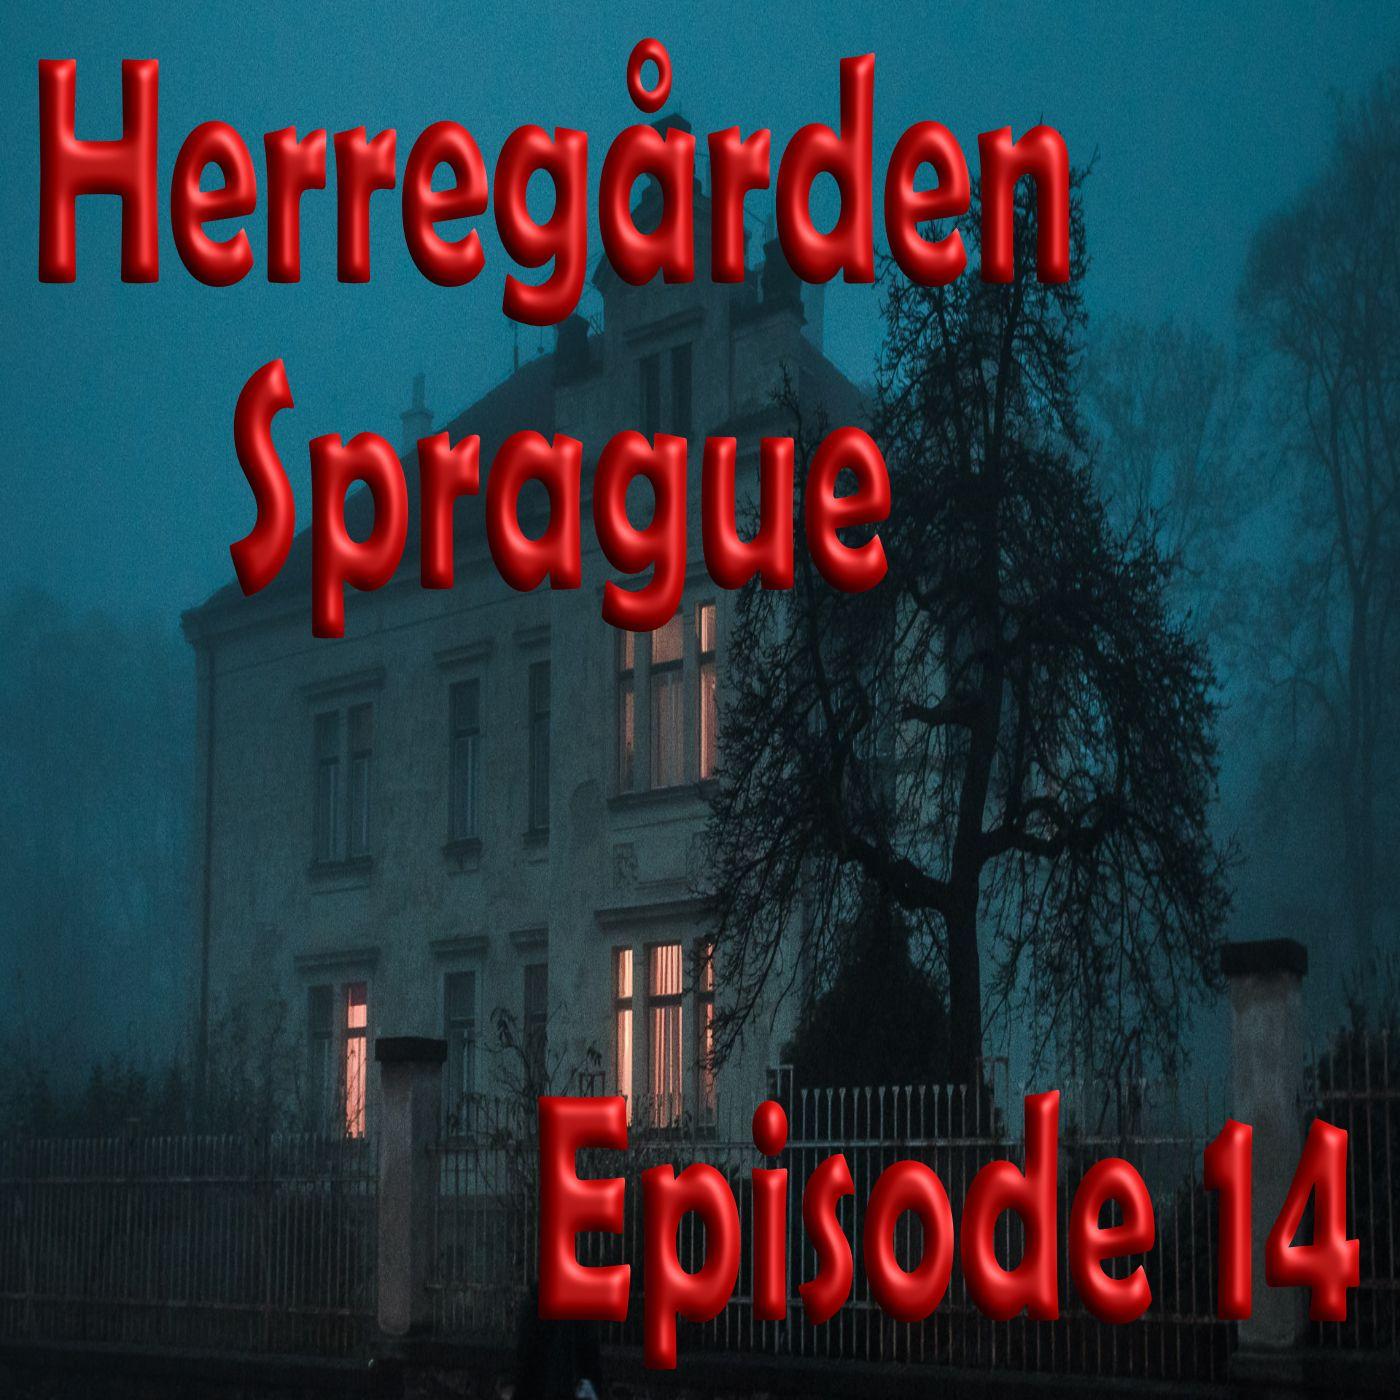 Fra den andre siden Episode 14. Herregården Sprague